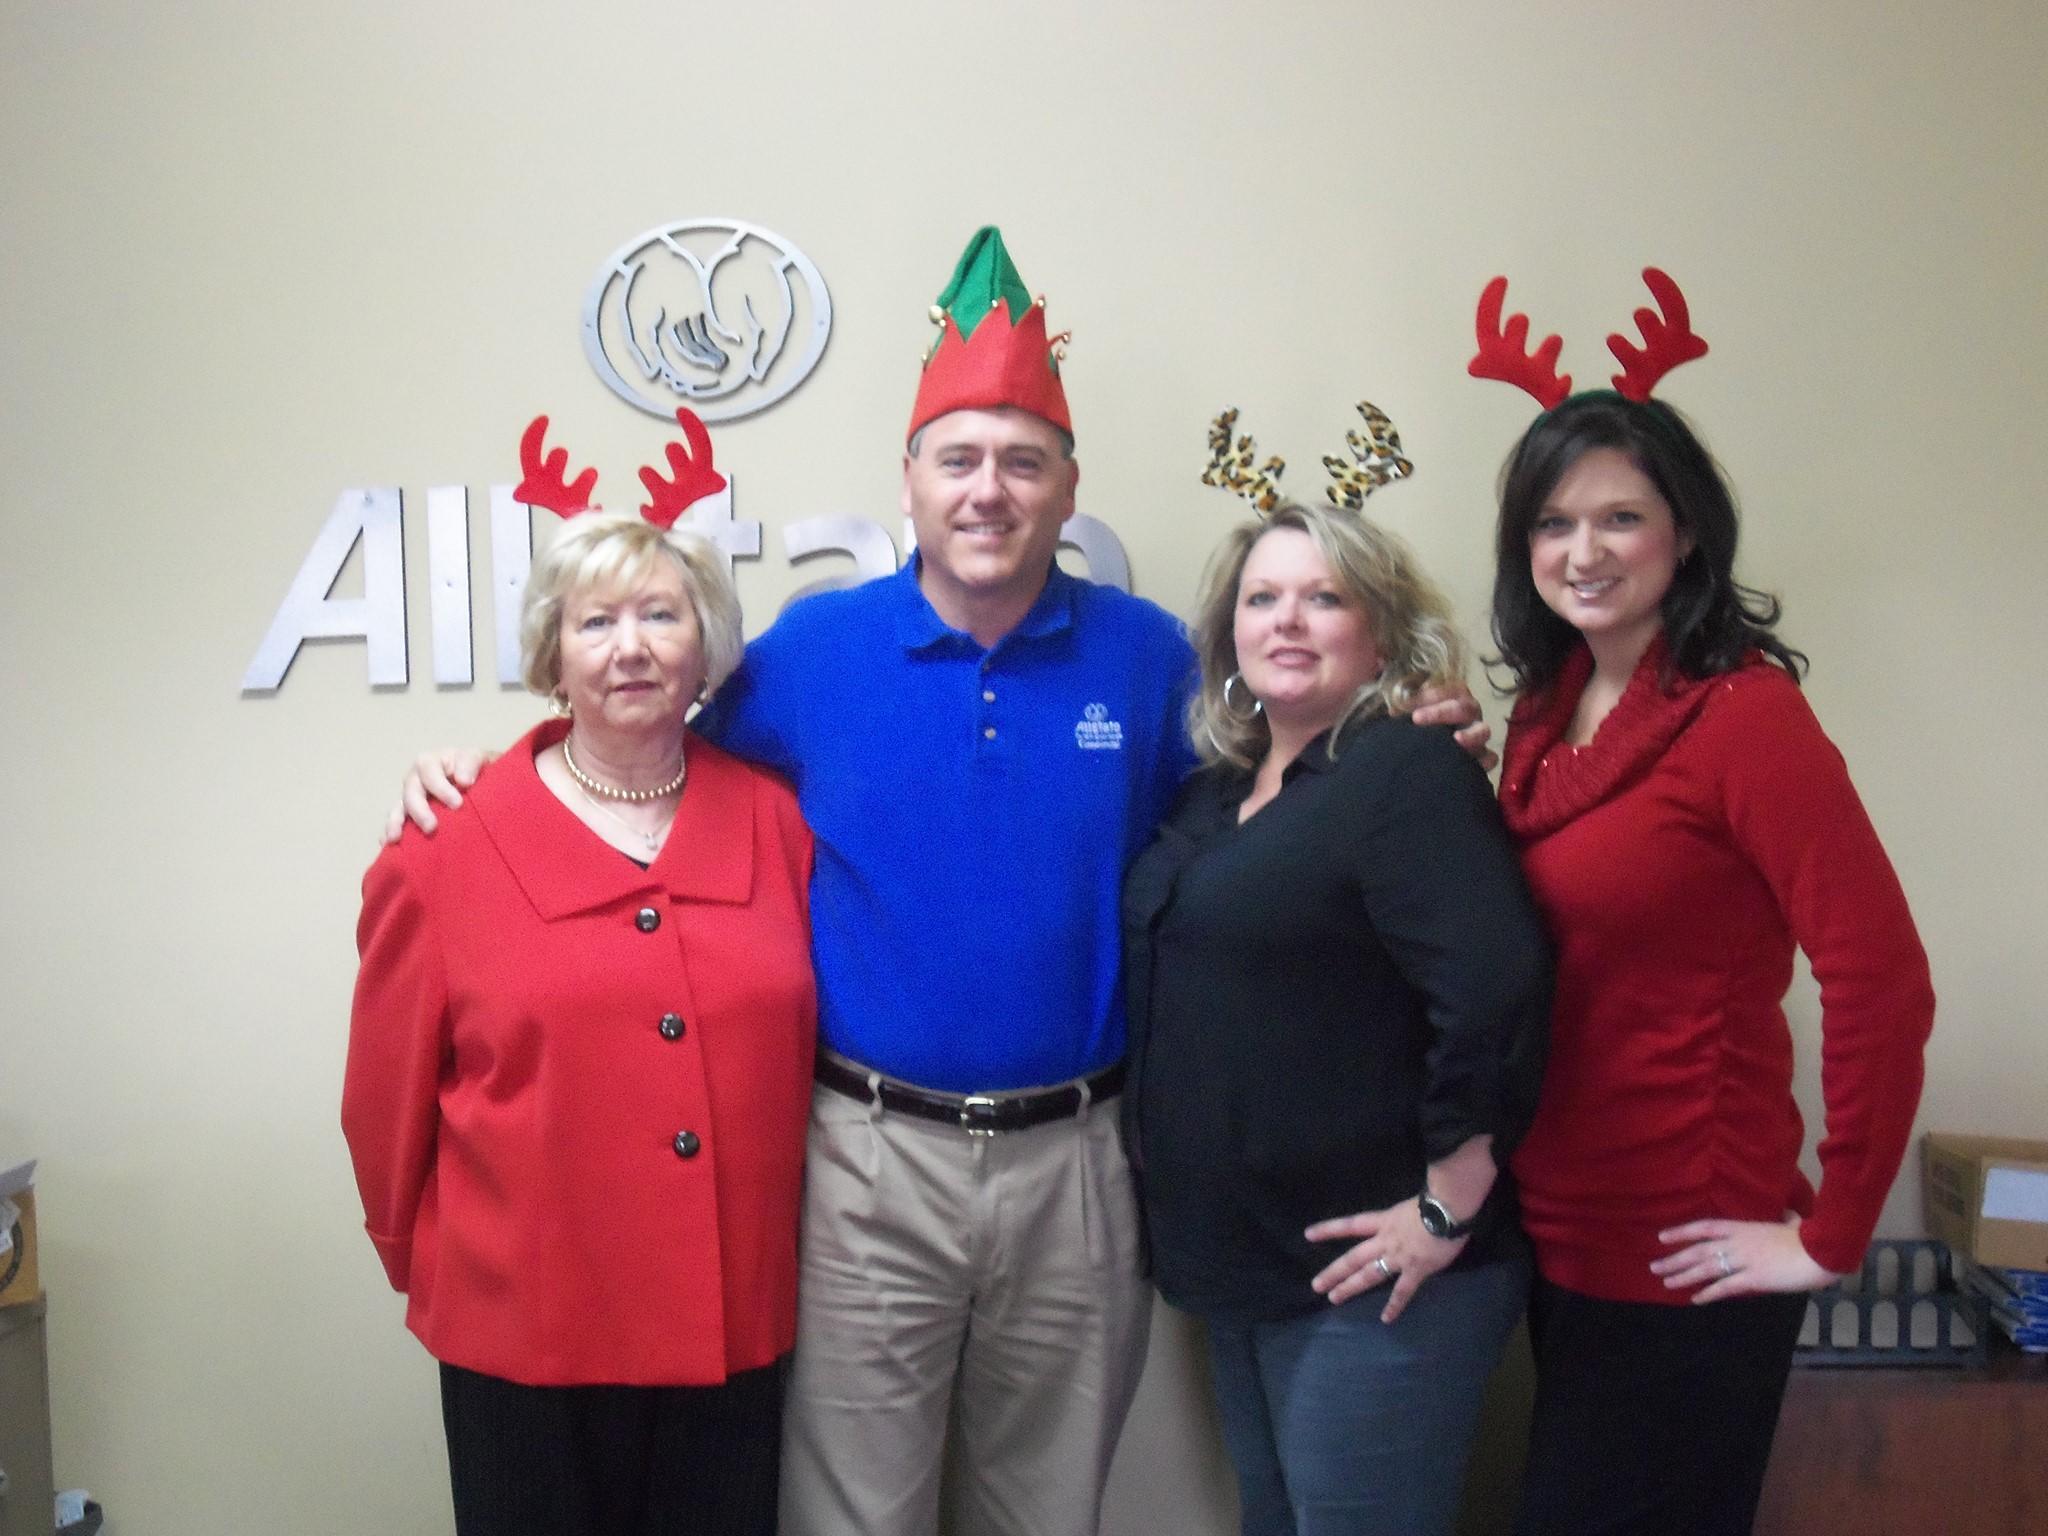 Blake Wright: Allstate Insurance image 3